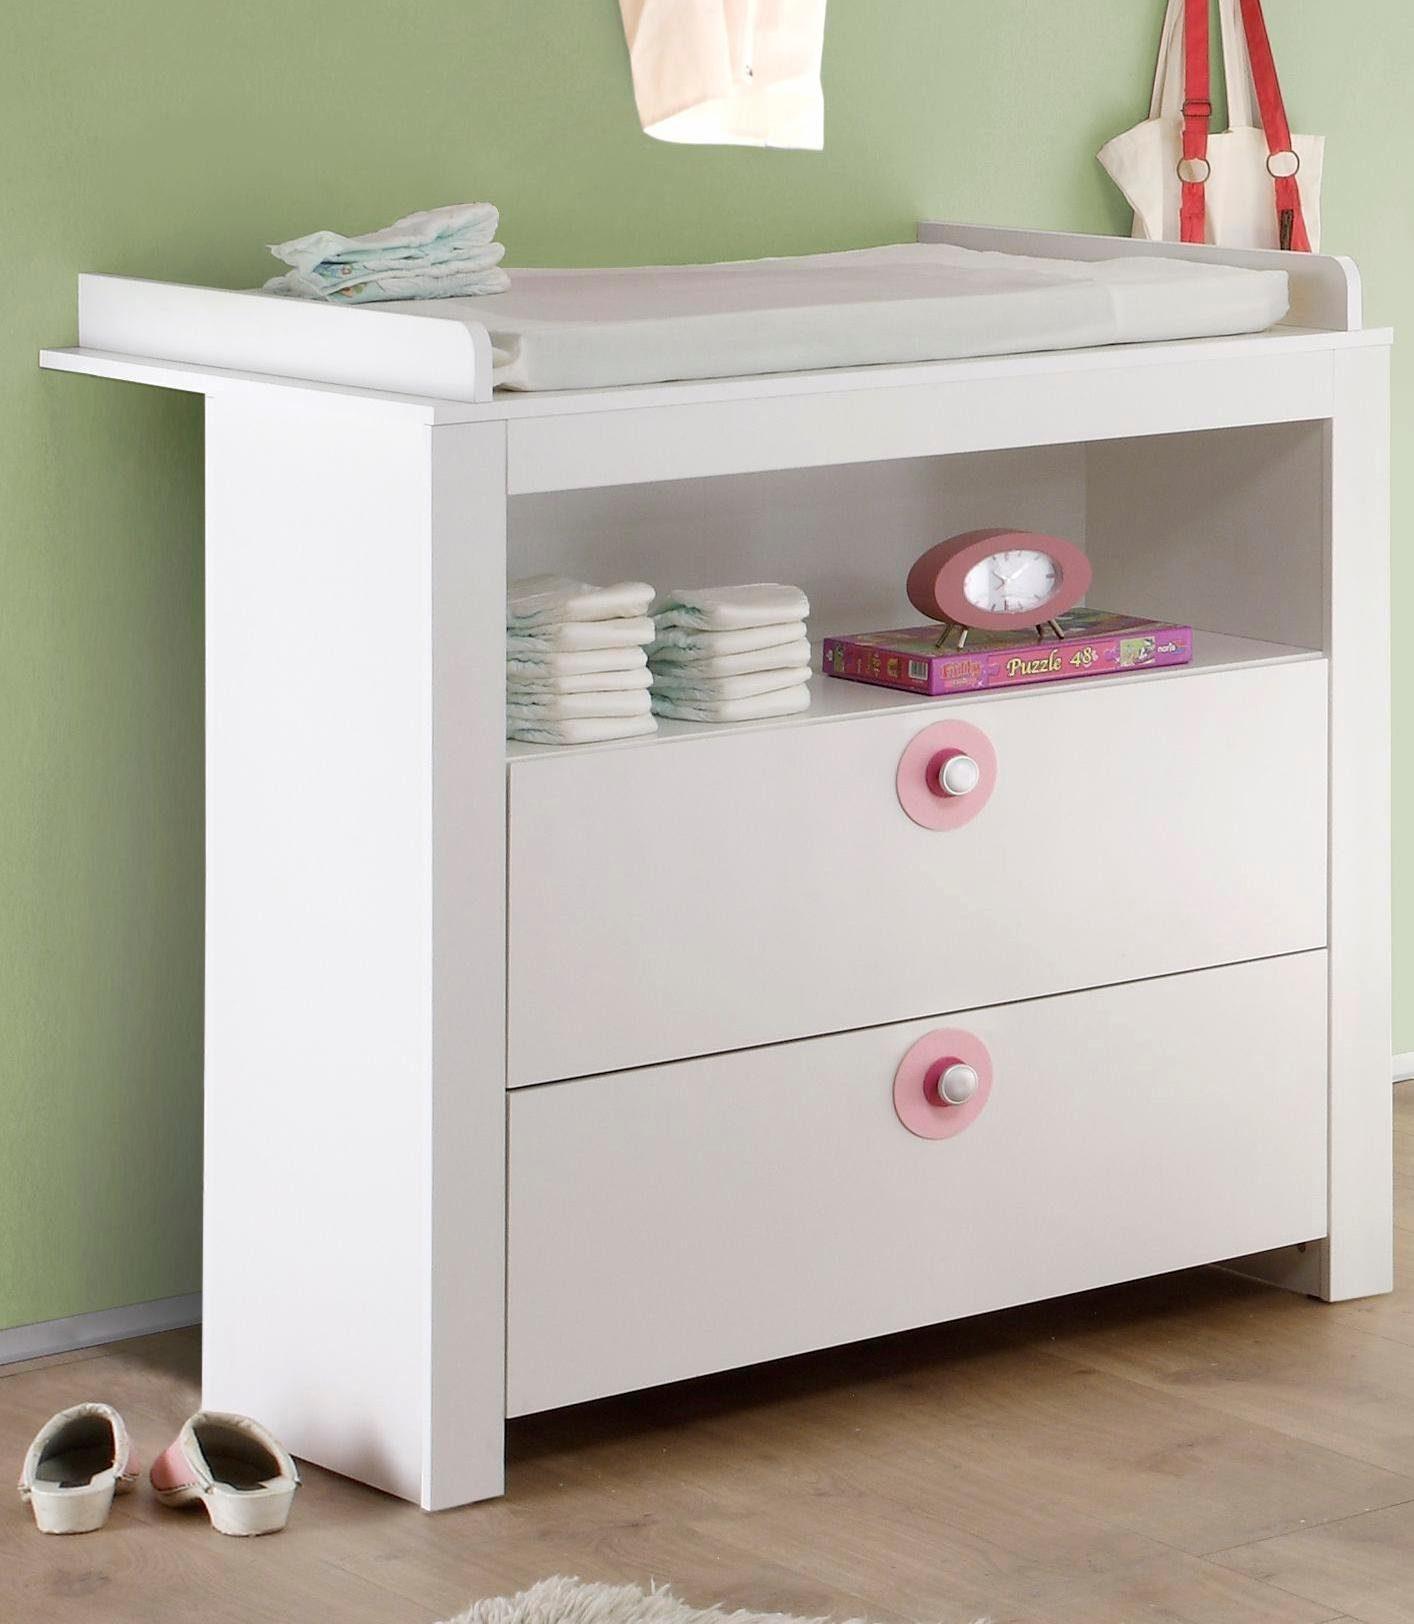 Wickelkommode zur Babymöbel Serie »Trend« in weiß